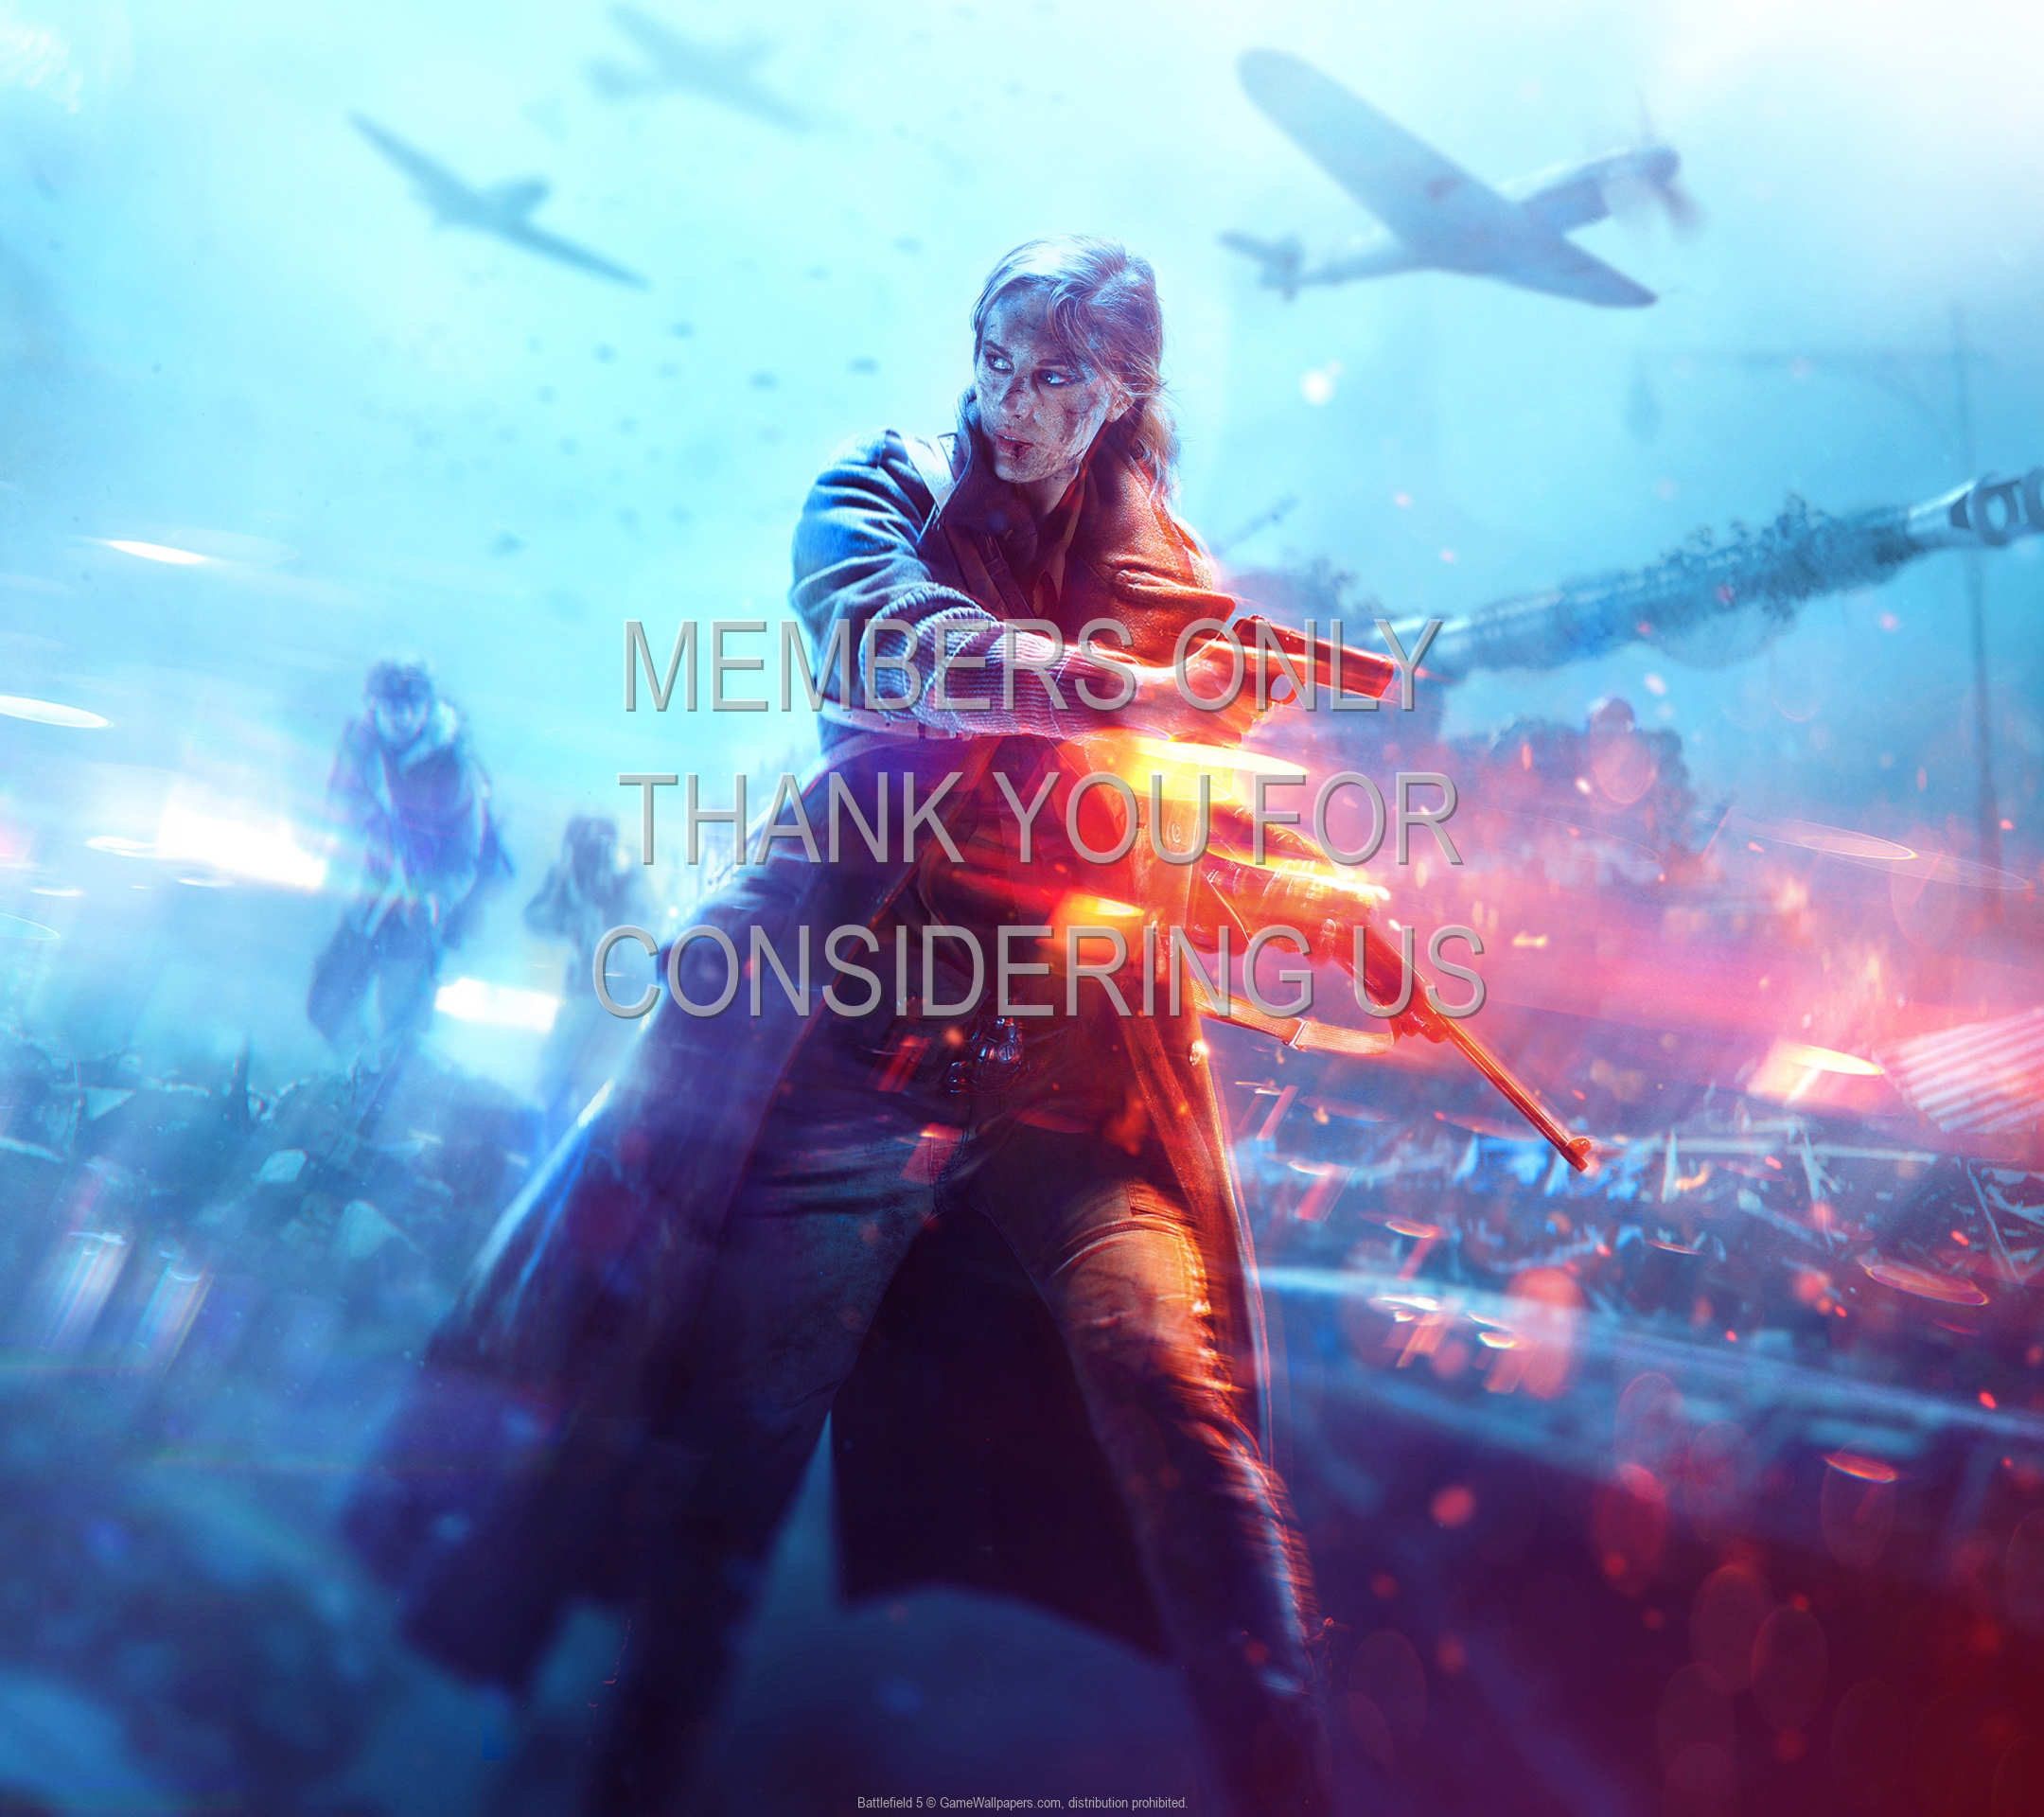 Battlefield 5 1920x1080 Mobile wallpaper or background 01